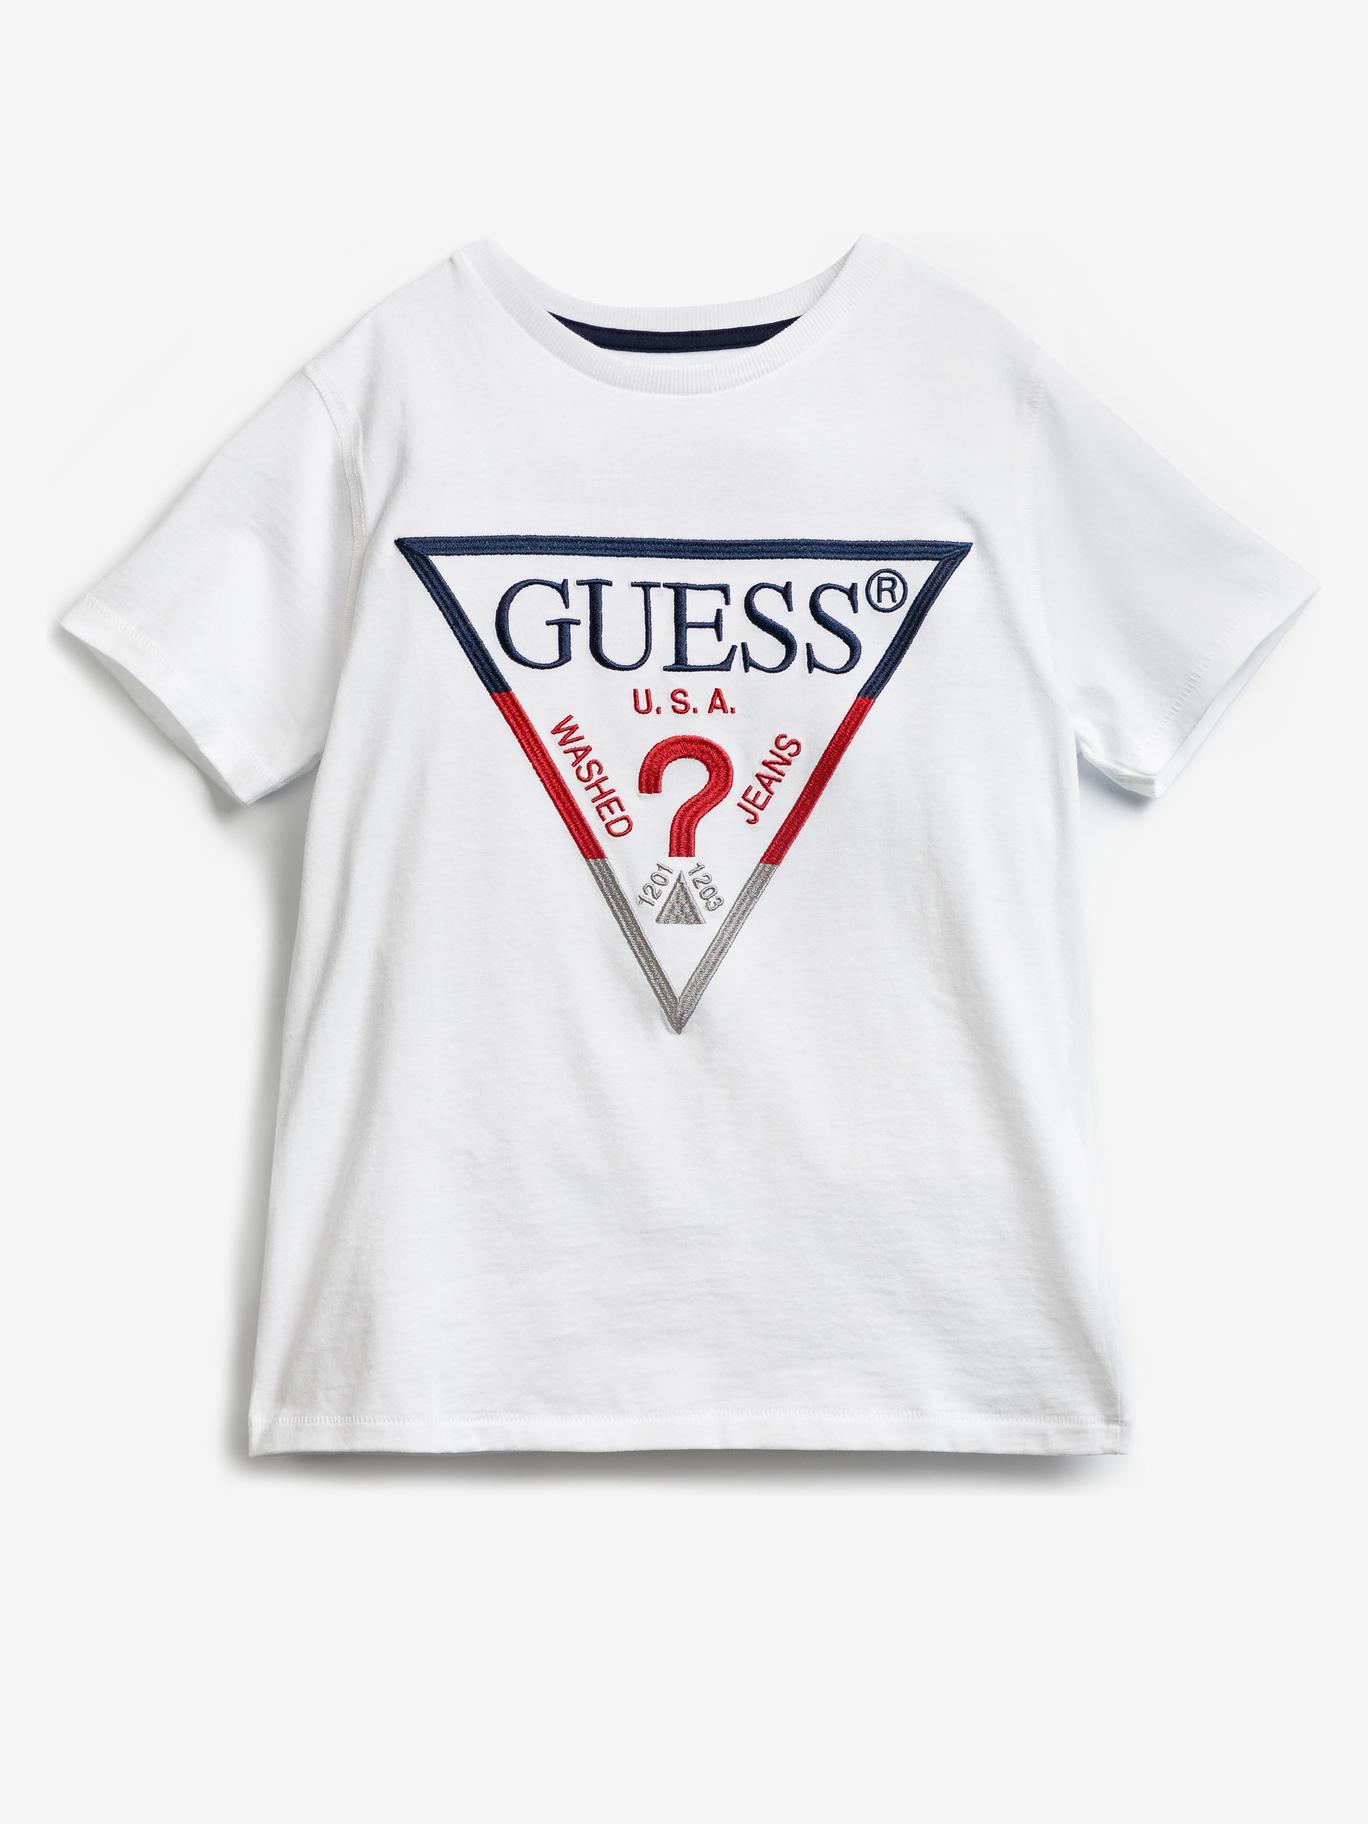 Guess Embroidery Front Logo Тениска детски Byal